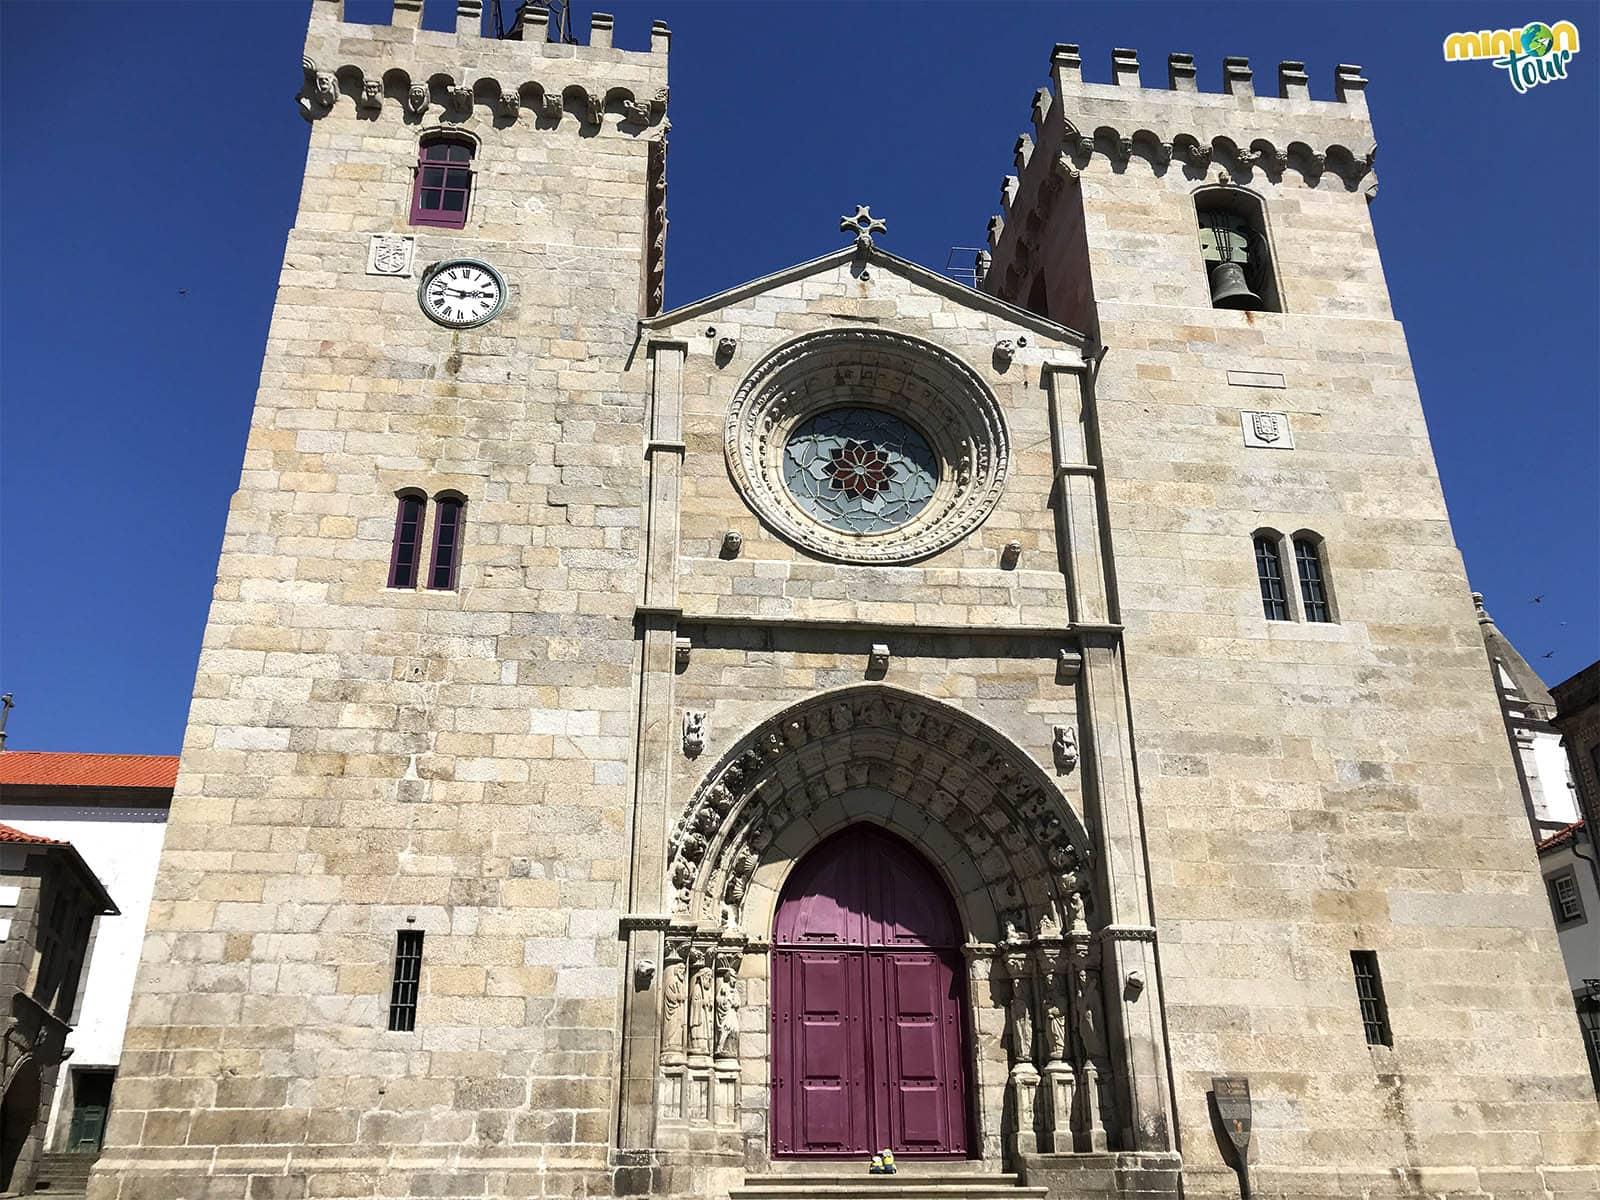 La Catedral de Viana do Castelo